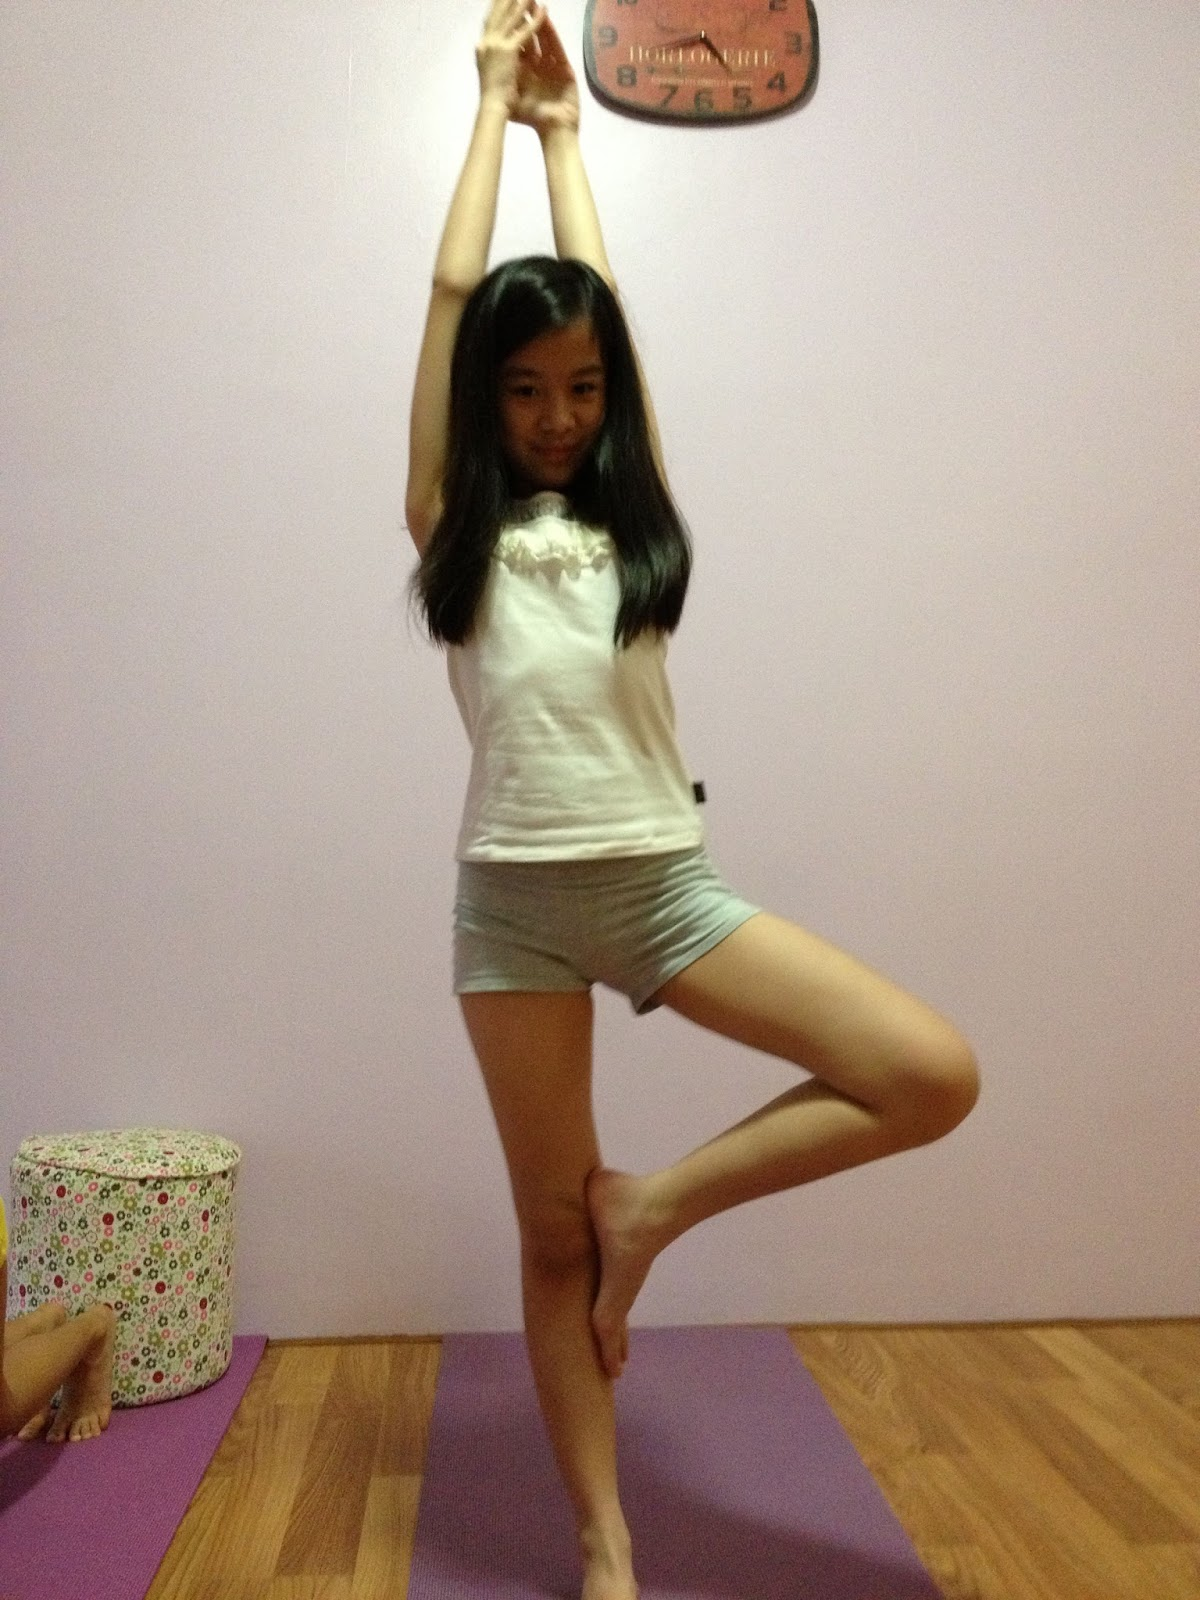 Karmarati Yoga: Pre-Teens Yoga Students Created Their Own